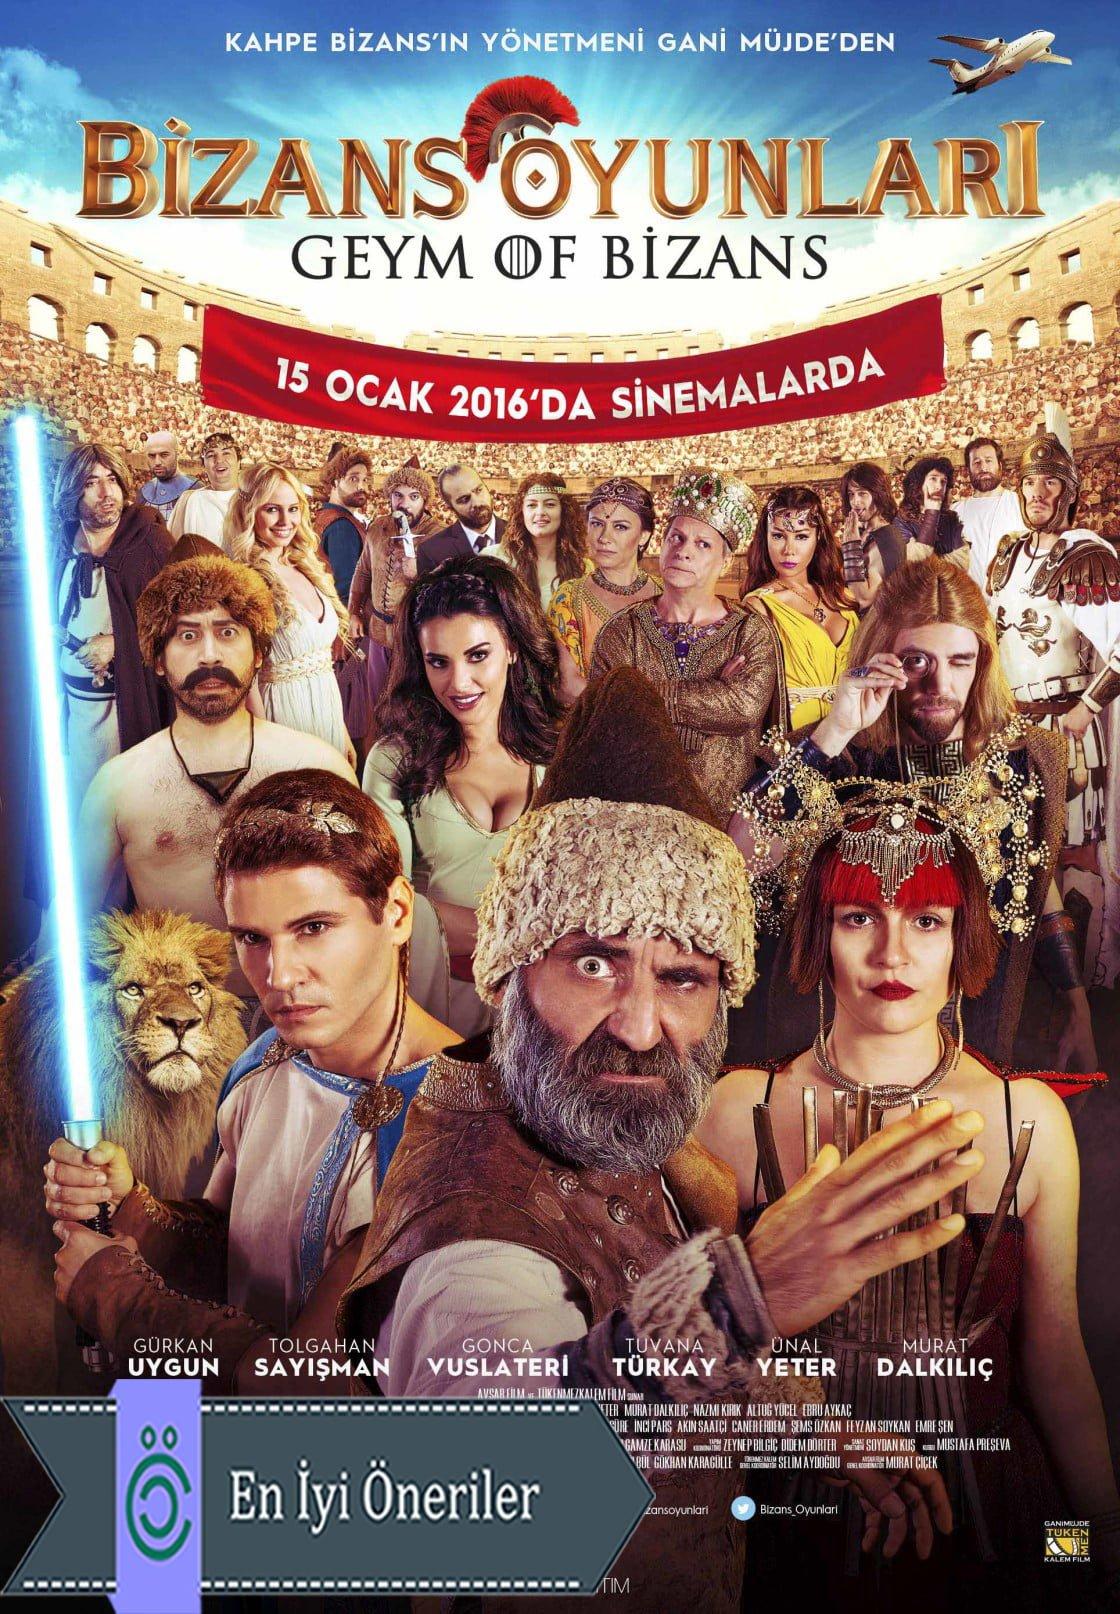 Bizans Oyunları Afiş